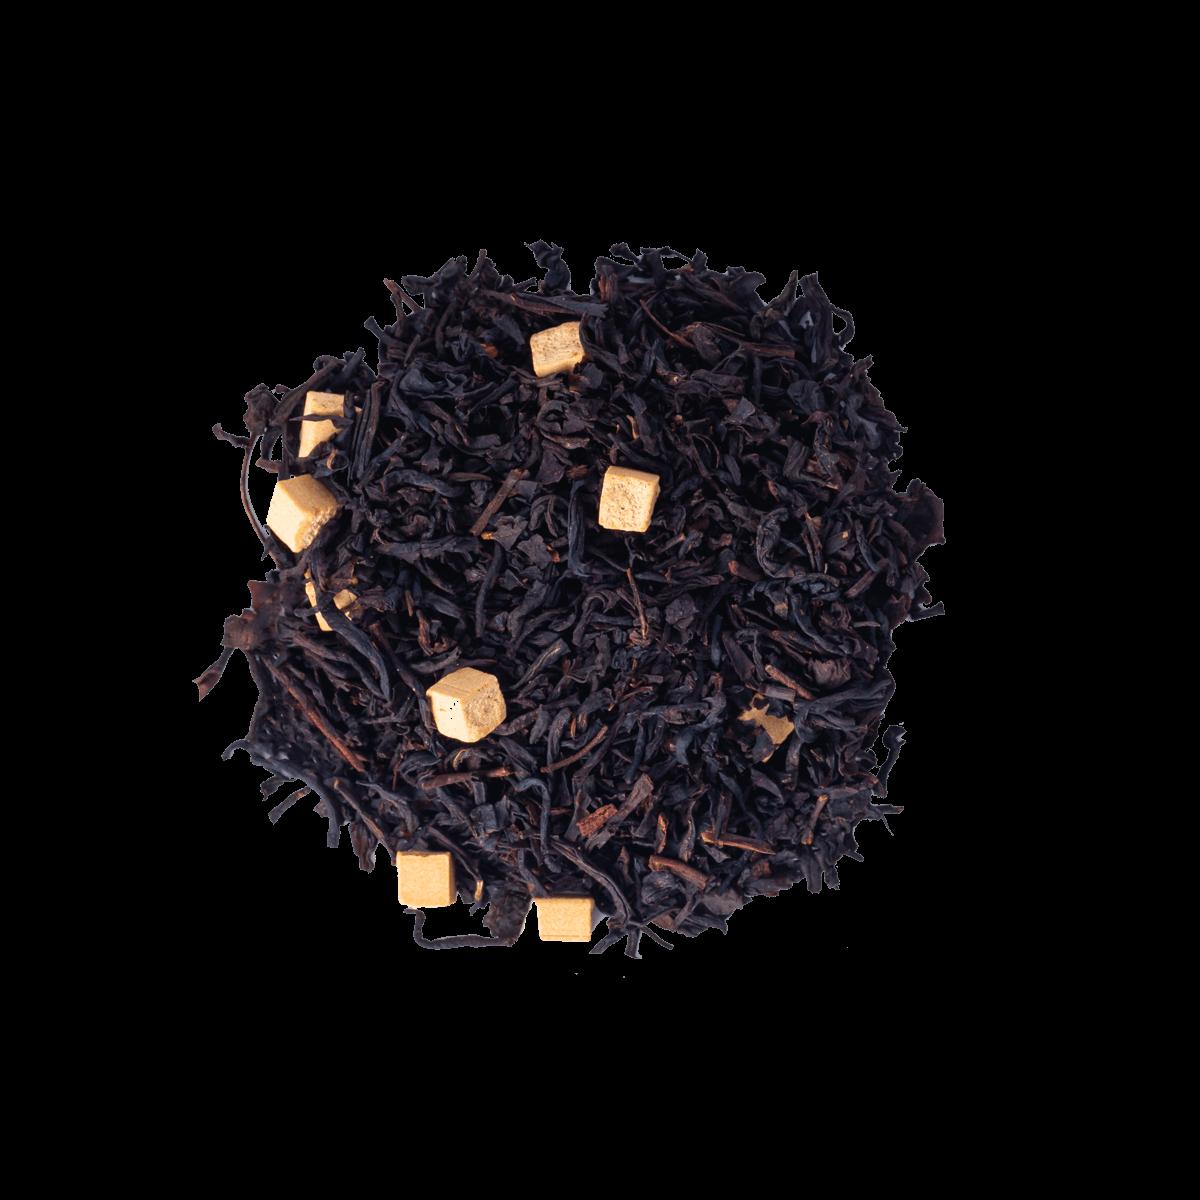 Black Tea Caramel